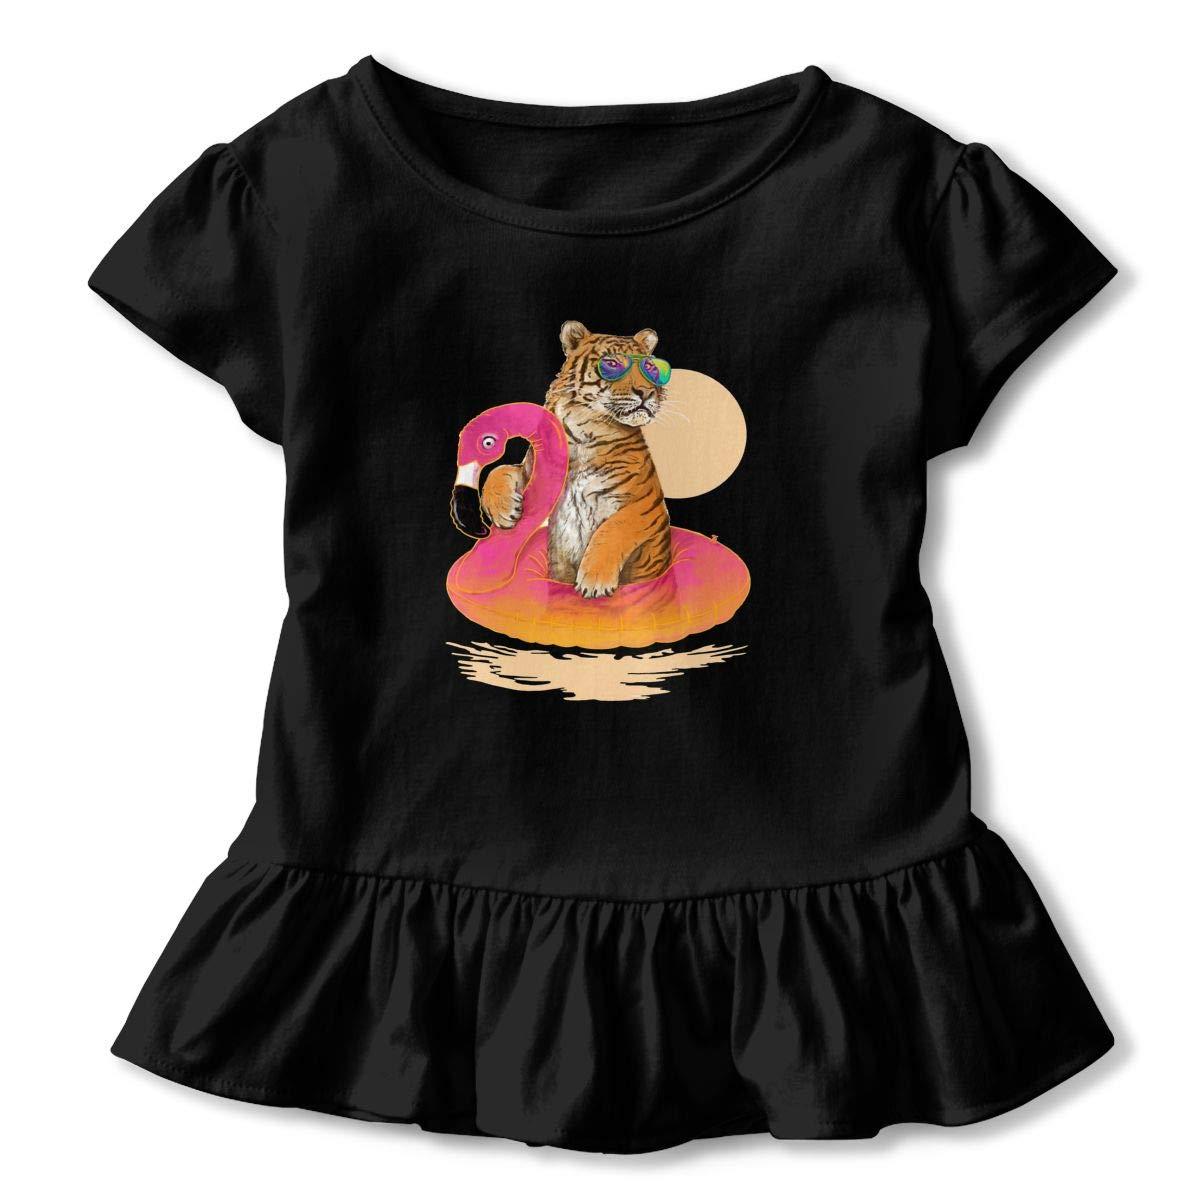 Chillin Toddler Girls T Shirt Kids Cotton Short Sleeve Ruffle Tee Flamingo Tiger